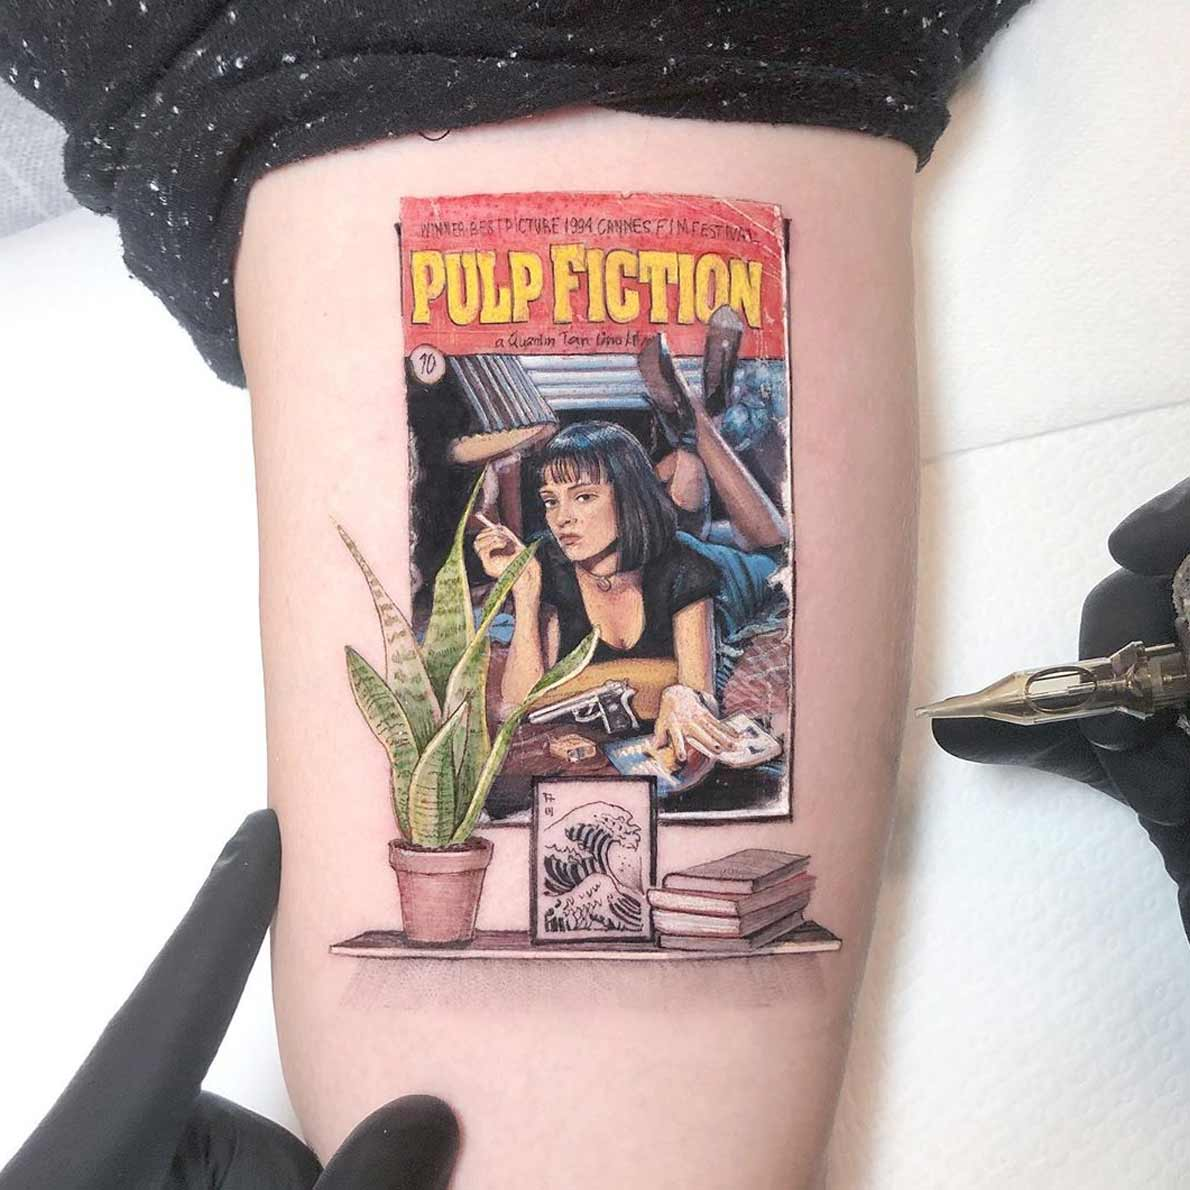 Gestochene Popkultur-Liebe von Eden Kozokaro aka Kozo Tattoo kozo-tattoos_12